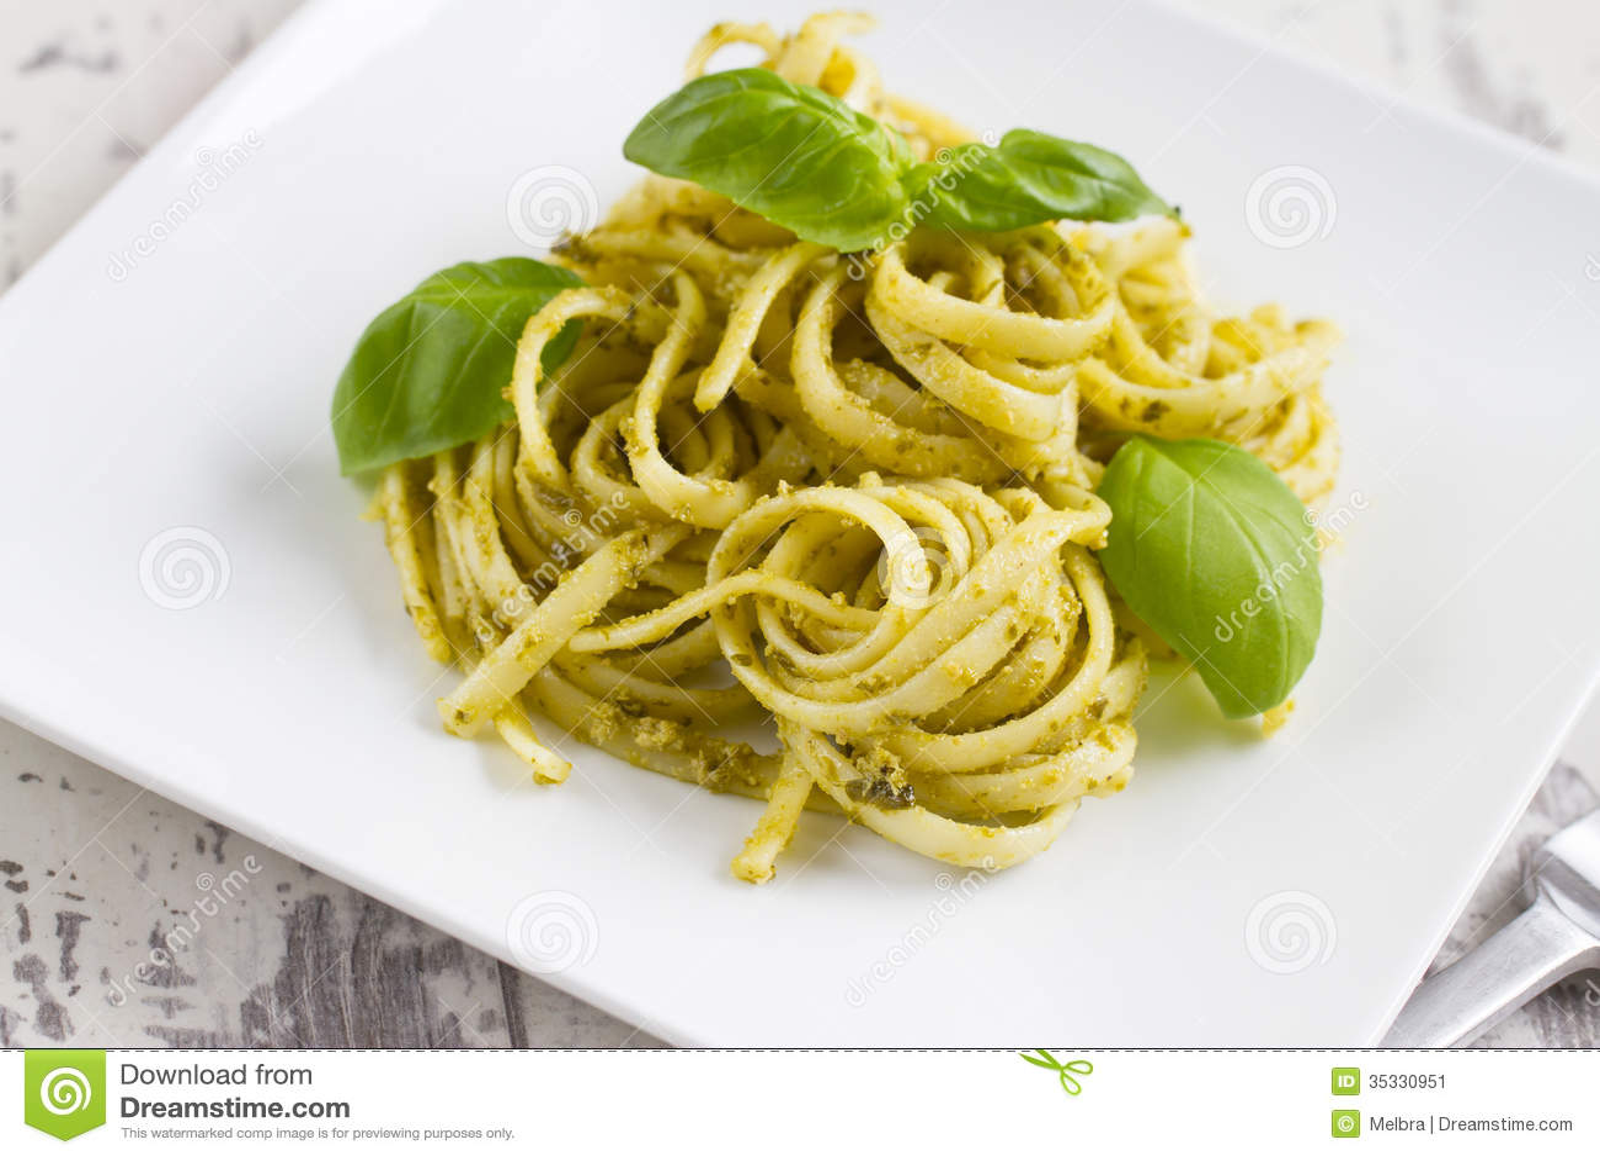 Spaghetti With Pesto And Basil Stock Image - Image: 35330951